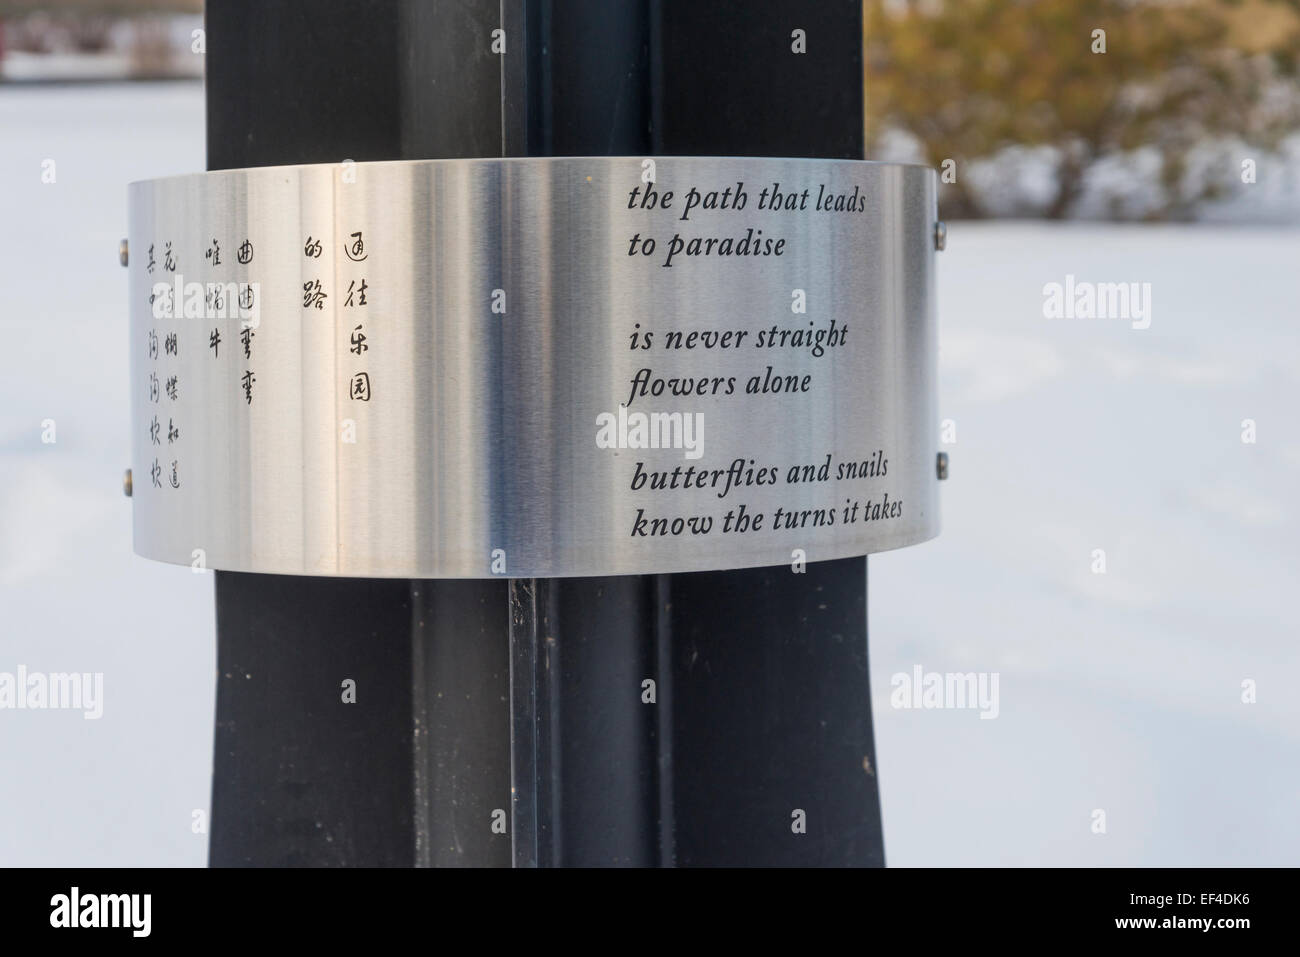 Poem on lamp post, Louise McKinney Park, Edmonton, Alberta, Canada - Stock Image